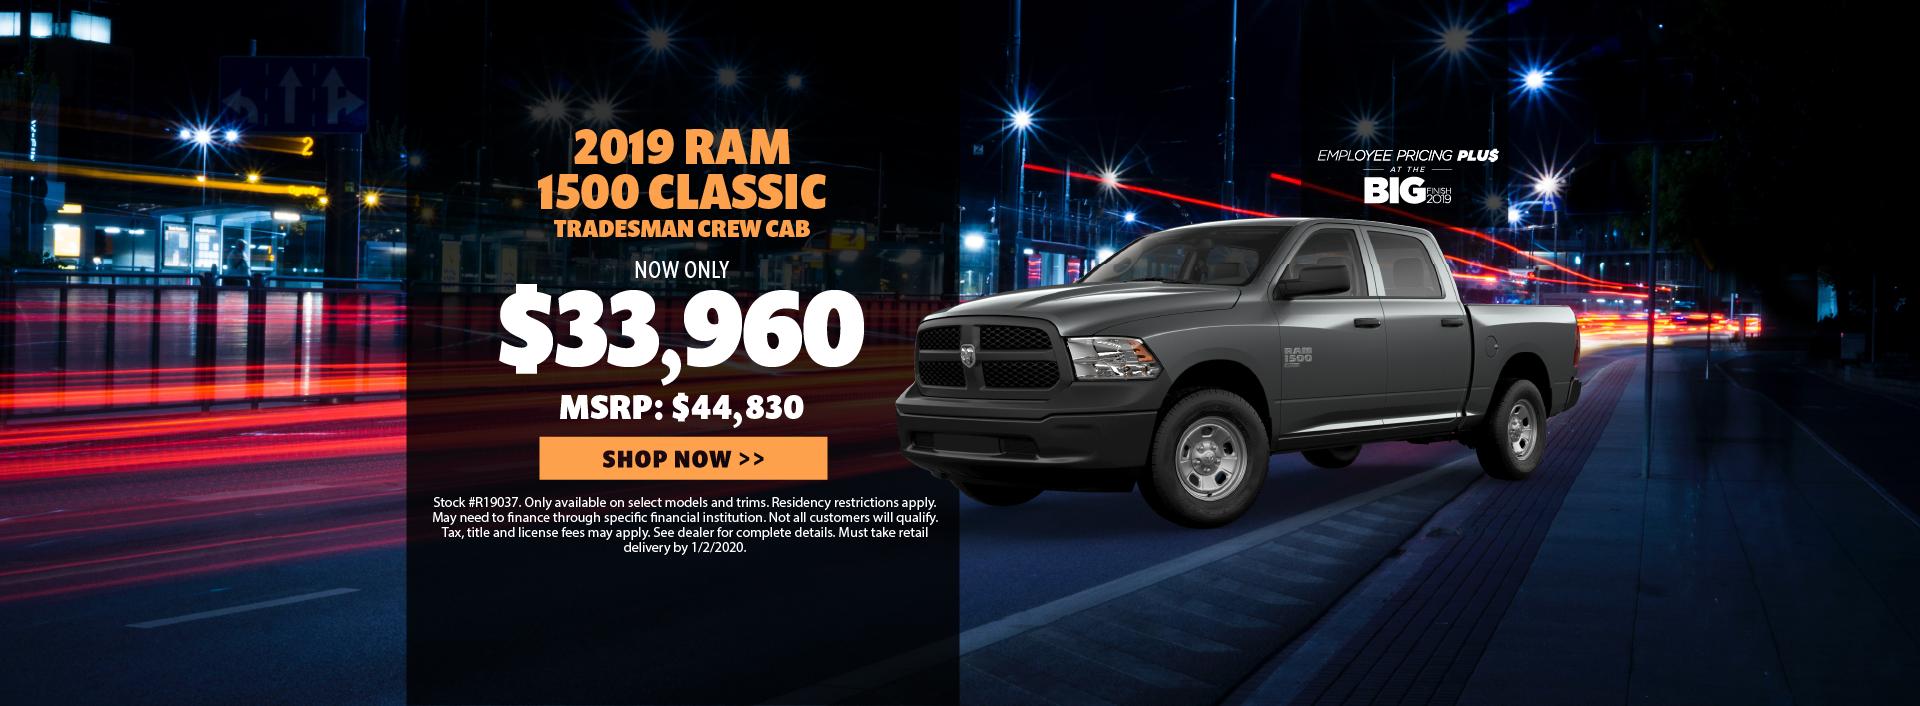 2019 Ram 1500 Classic Offer